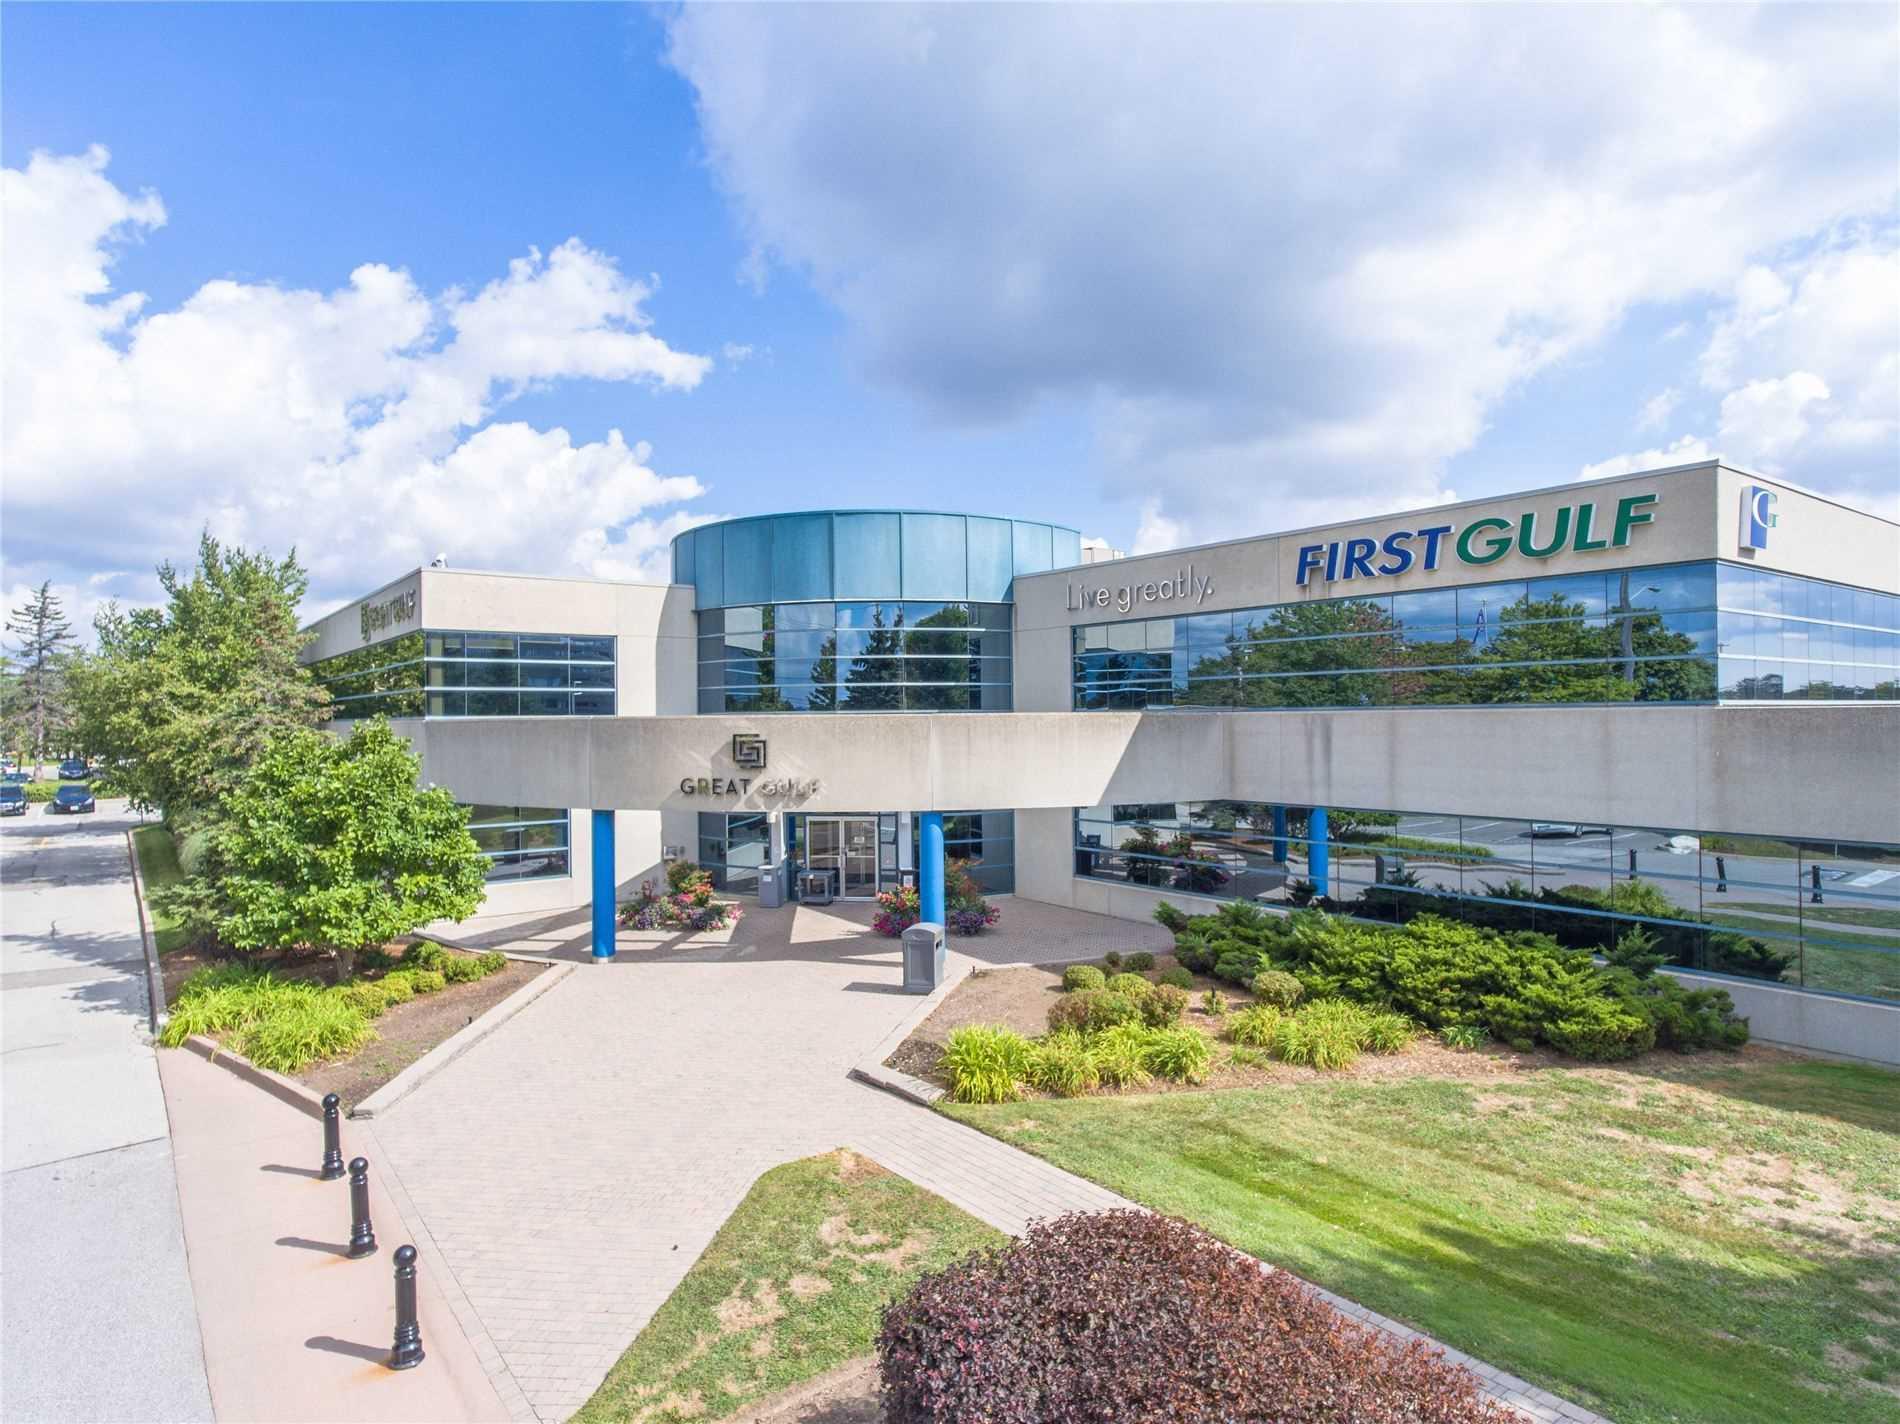 3751 Victoria Park Ave, Steeles, Toronto, Ontario M1W3Z4, ,Office,For Sale,Victoria Park,E4930393